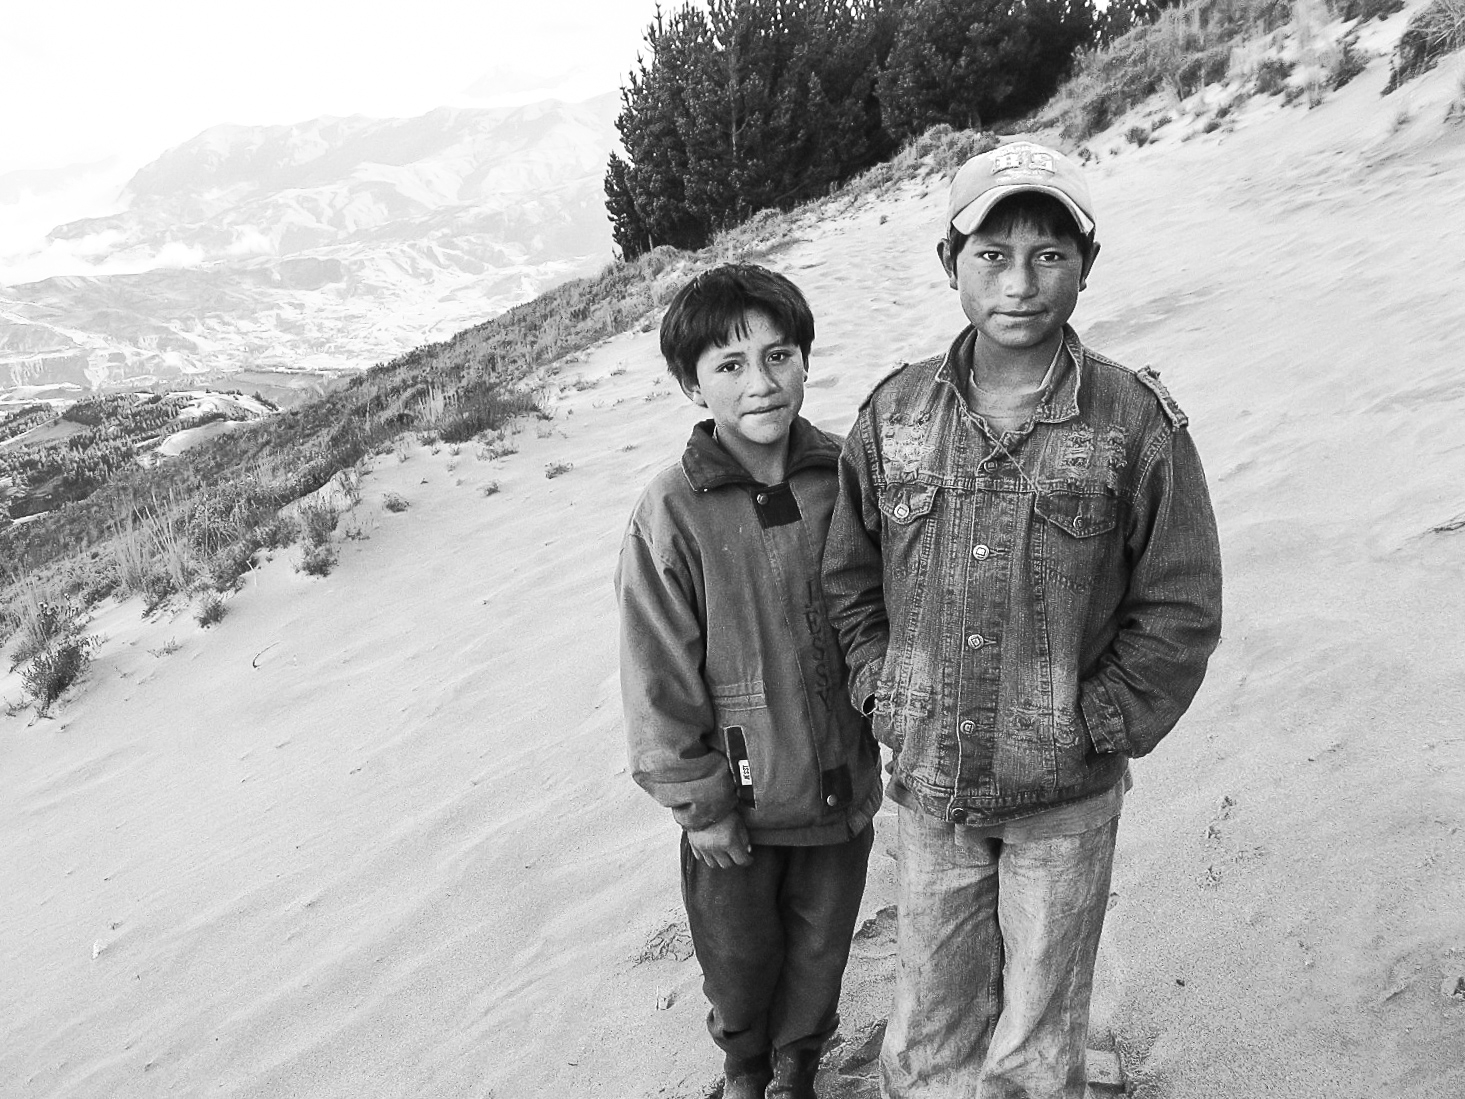 latagunga-to-chugchilan-gringoloop_quilotoacrater-past-guayama-to-chugchilan-9328-two-ecuadorian-boys.jpg